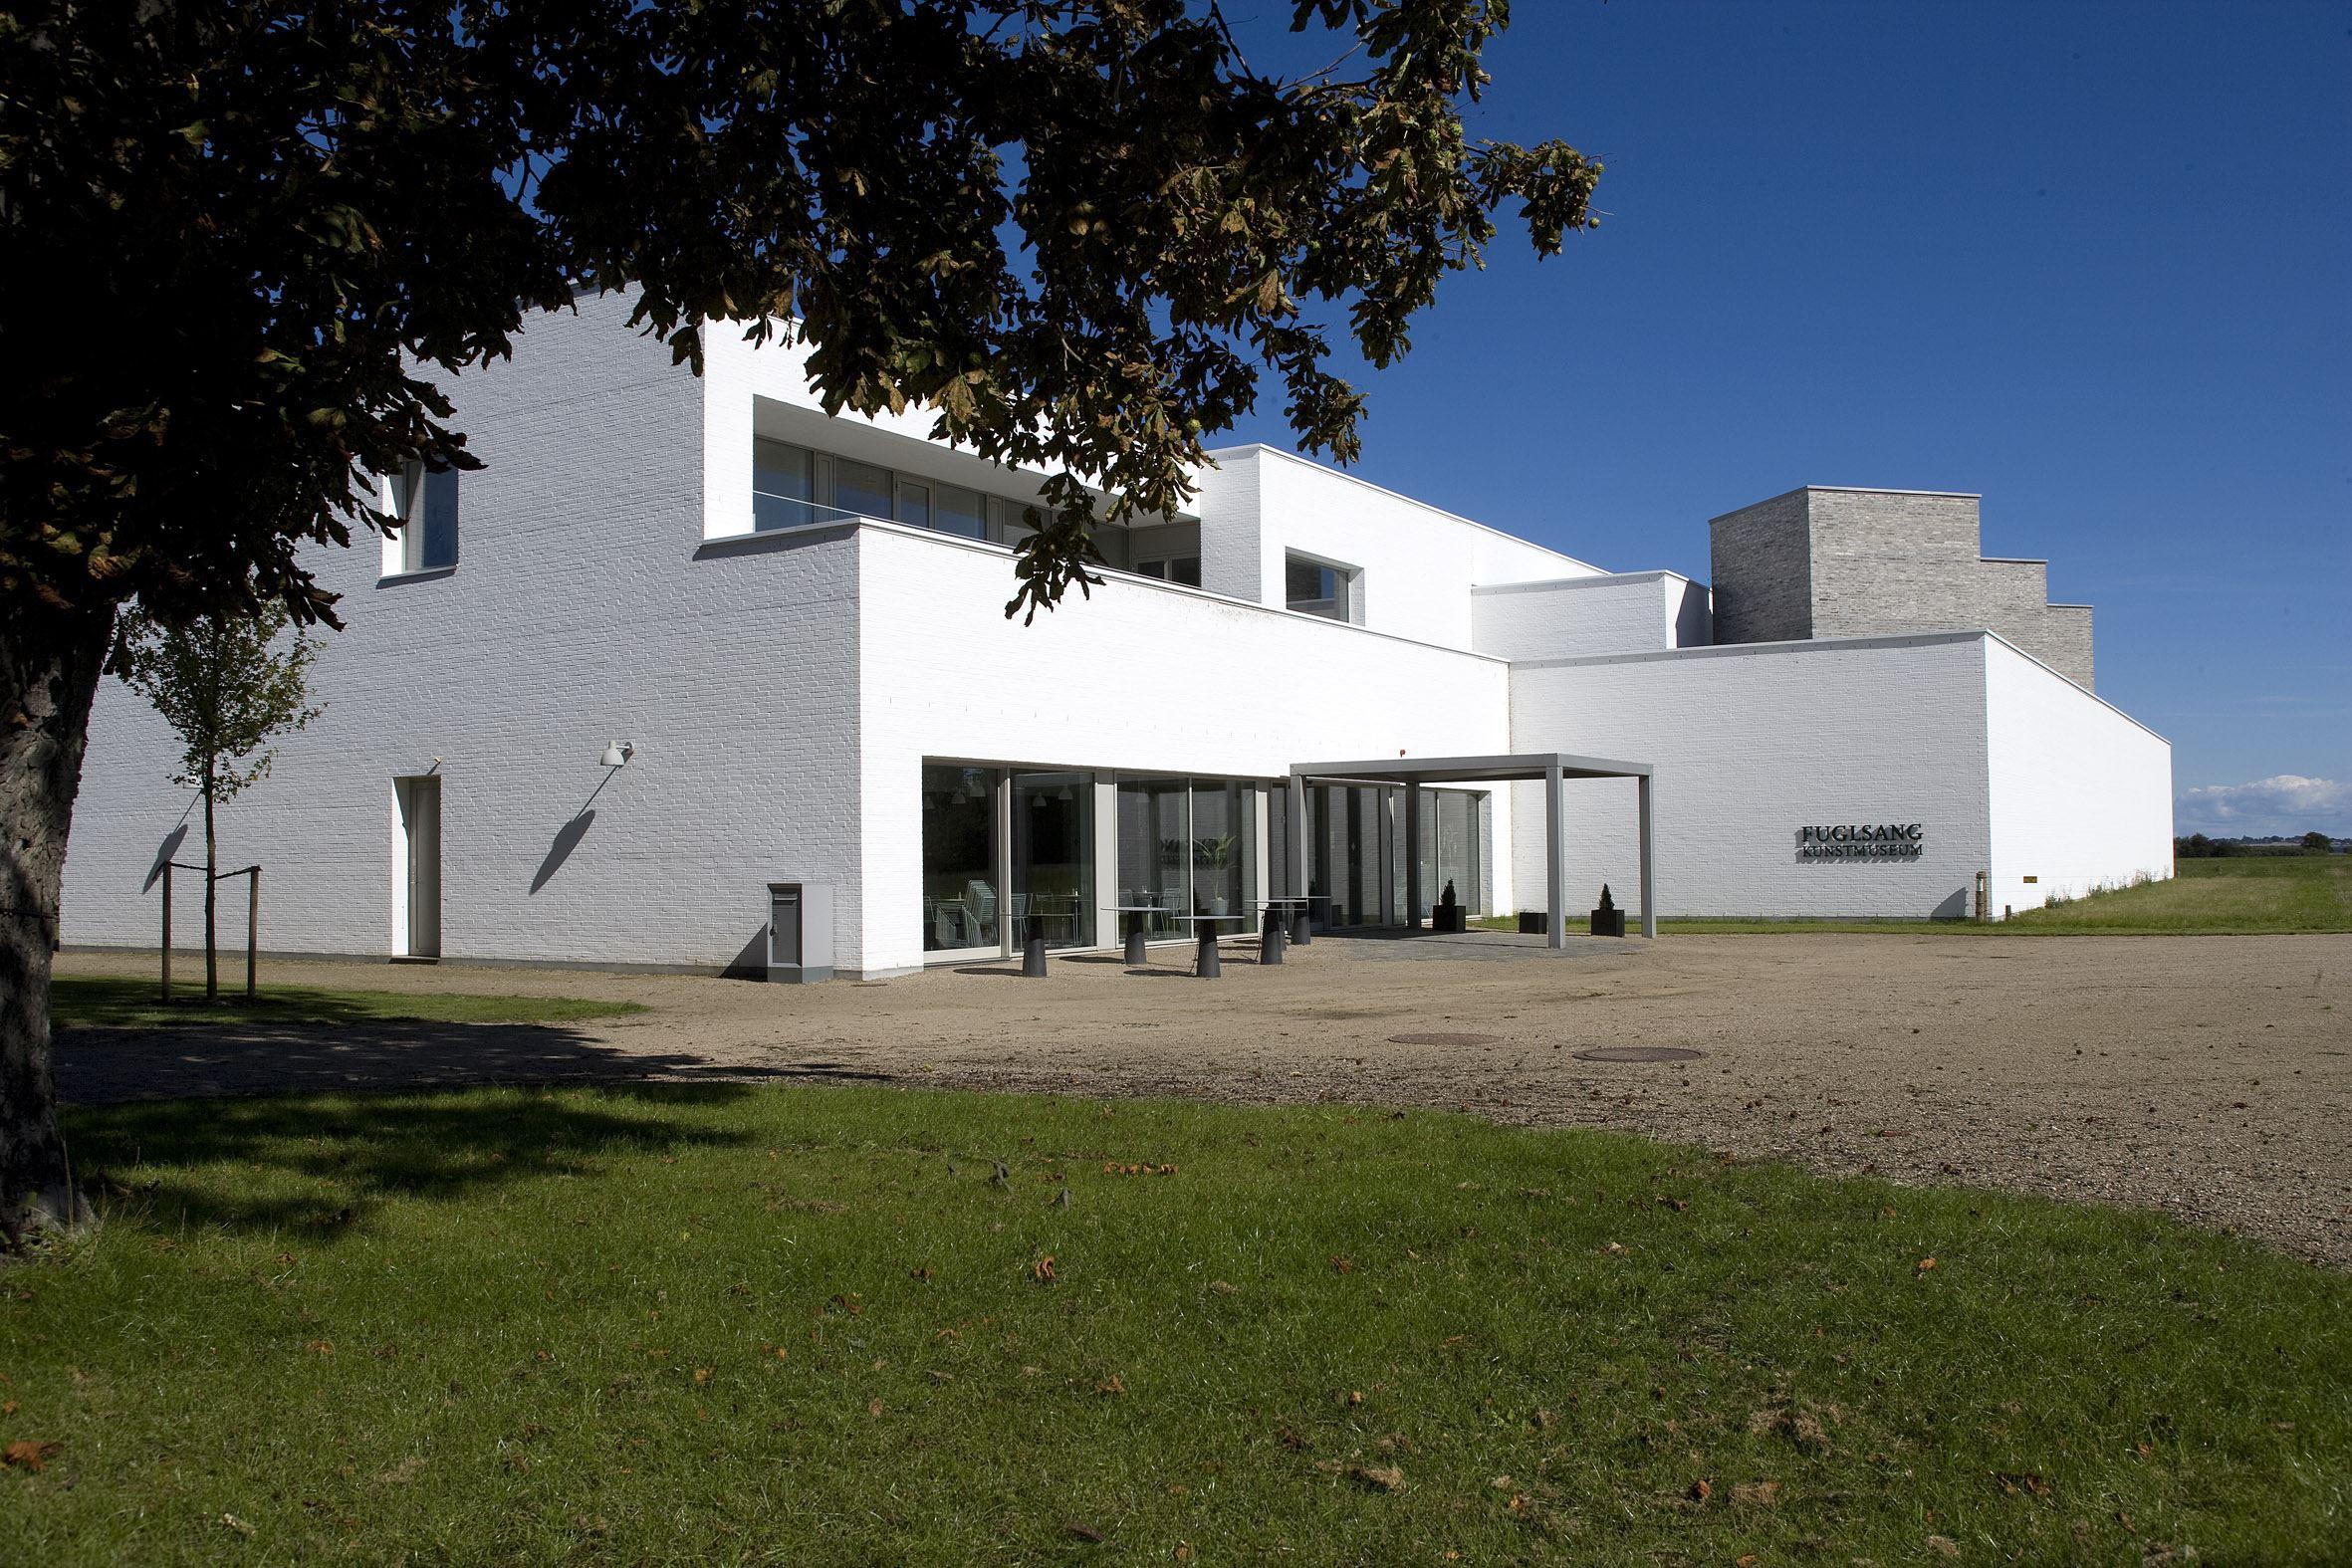 Fuglsang Kunstmuseum